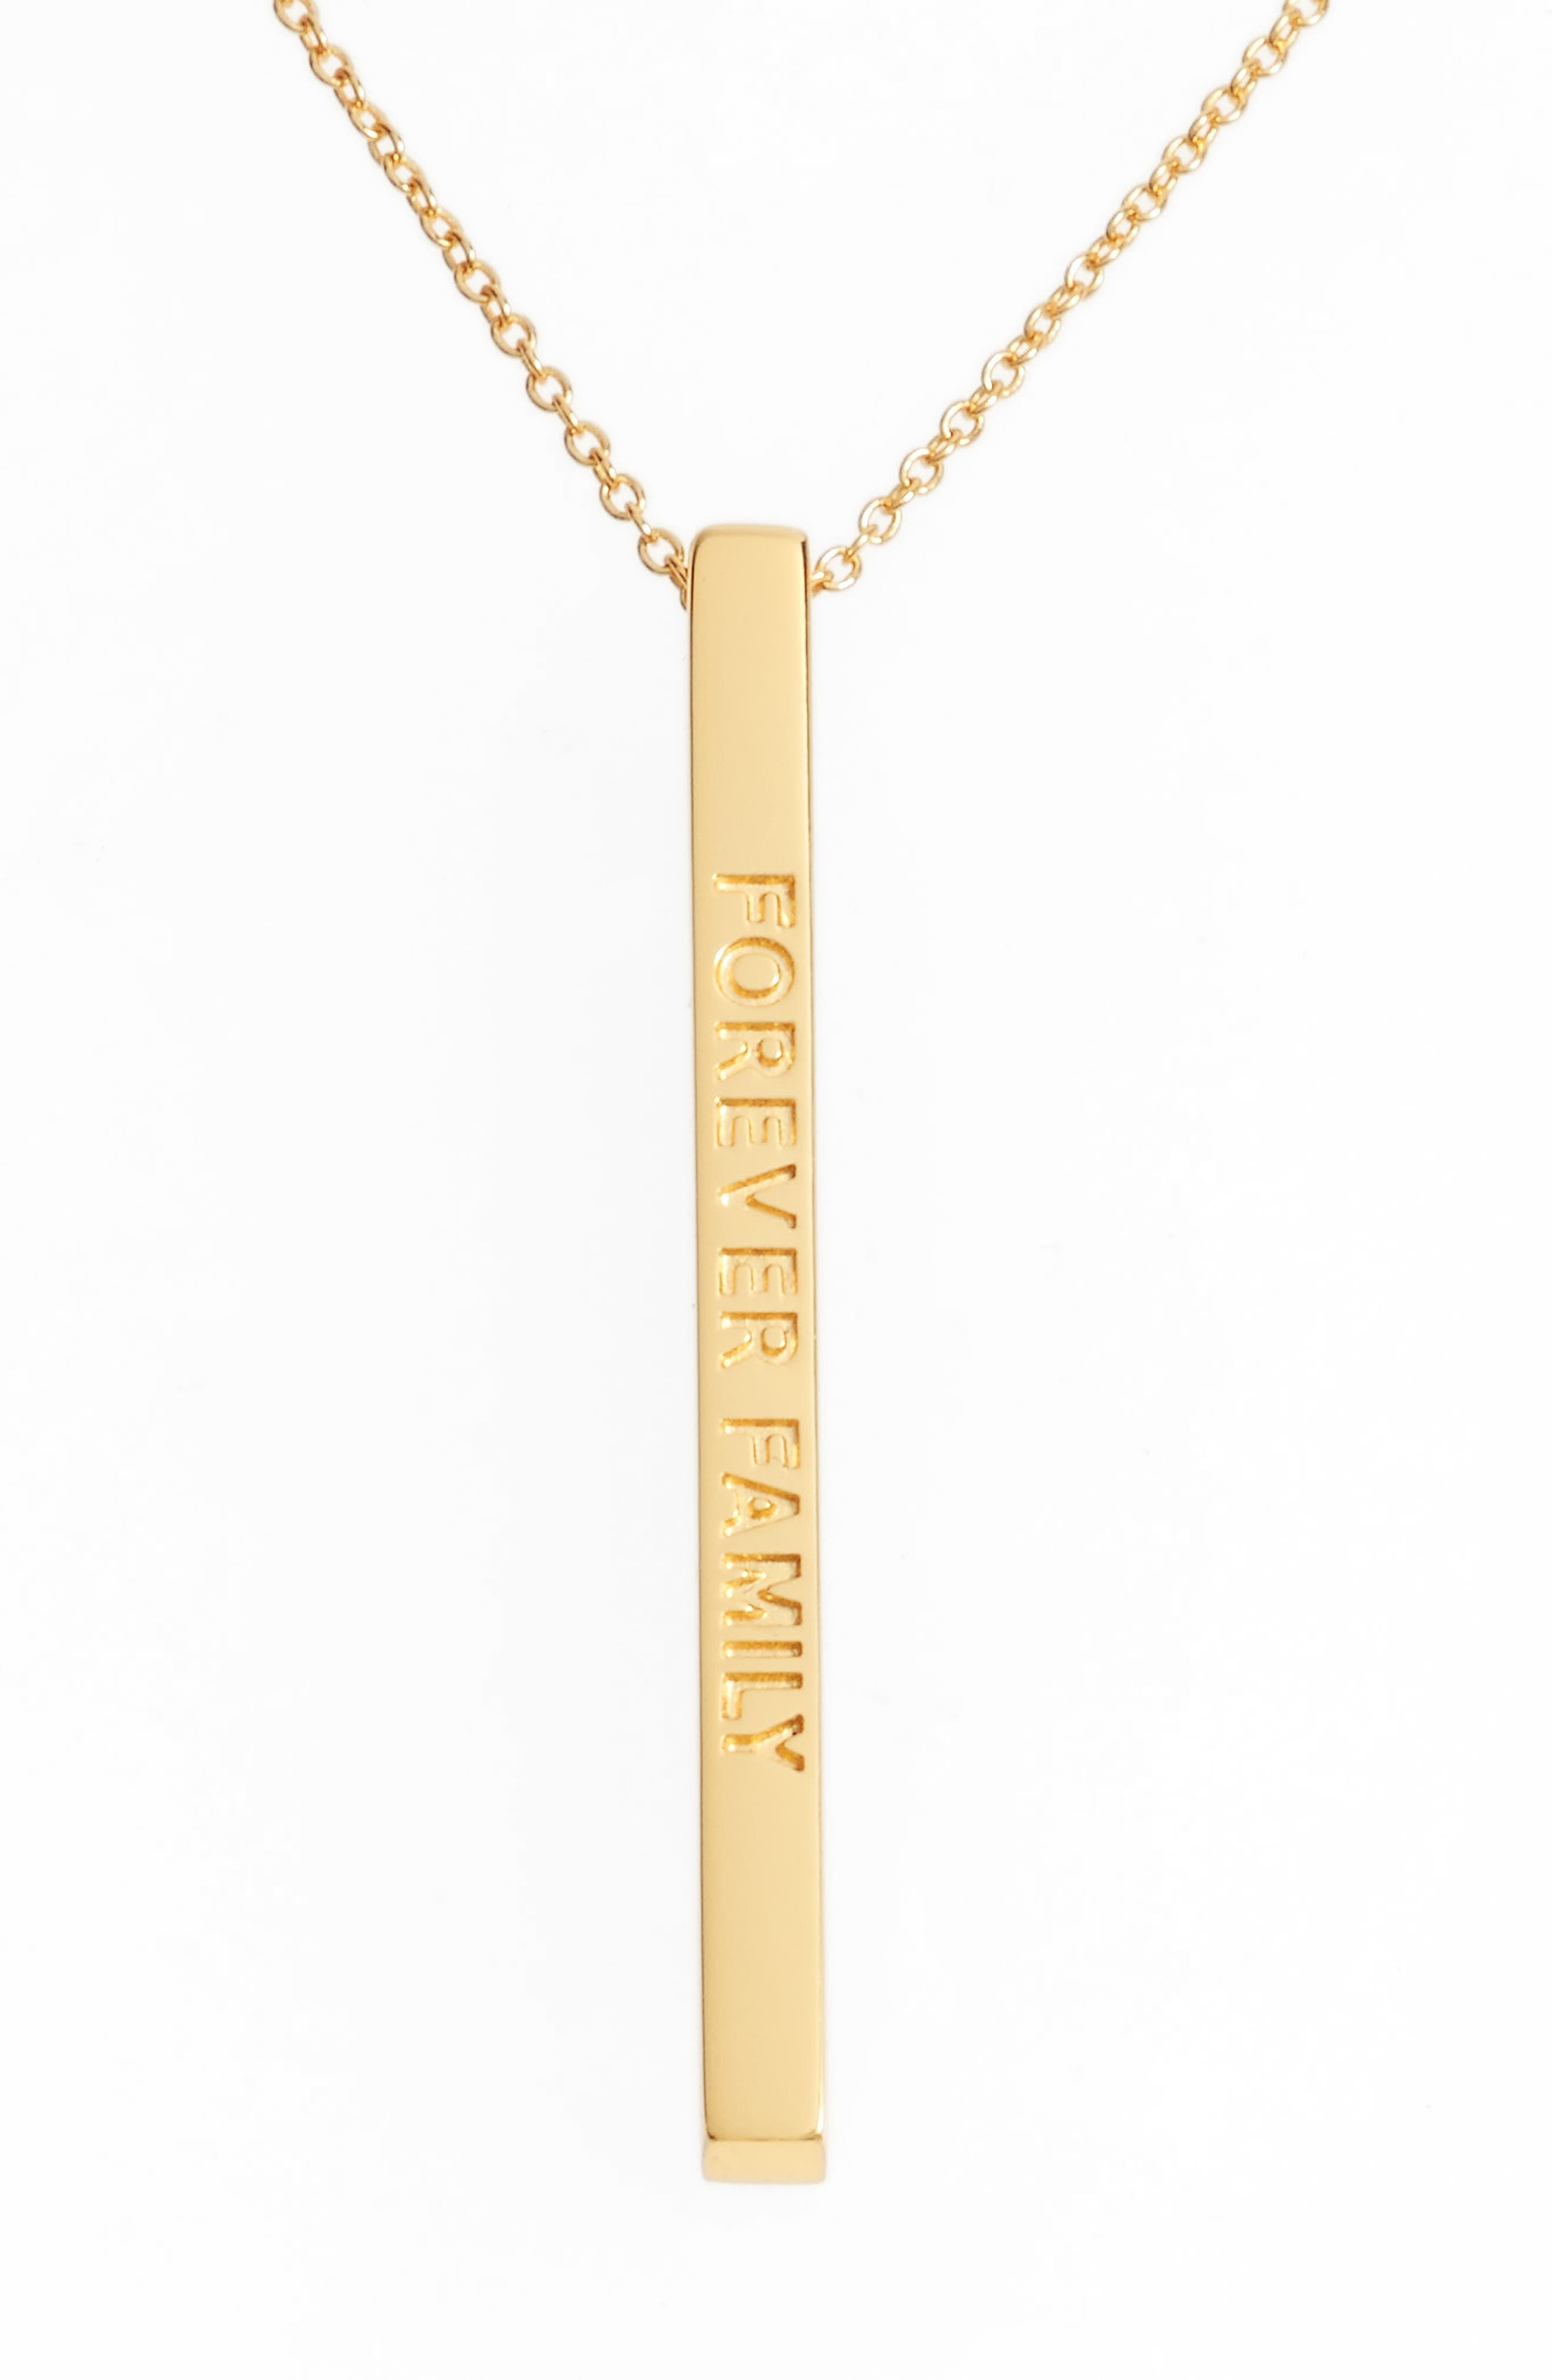 Main Image - MantraBand® Forever Family Pendant Necklace